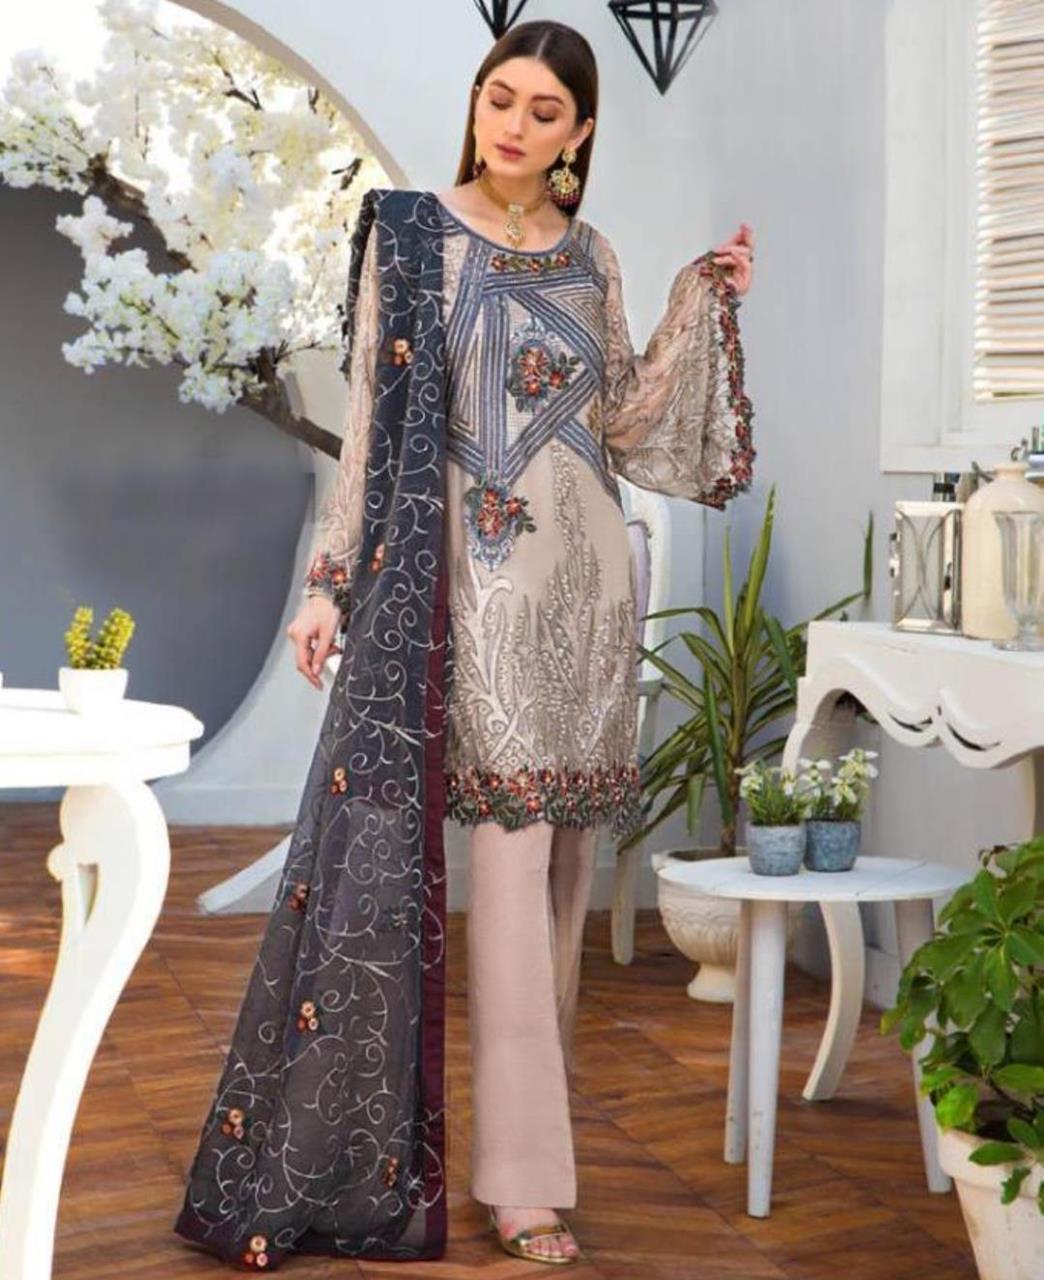 Embroidered Georgette Straight cut Salwar Kameez in Beige